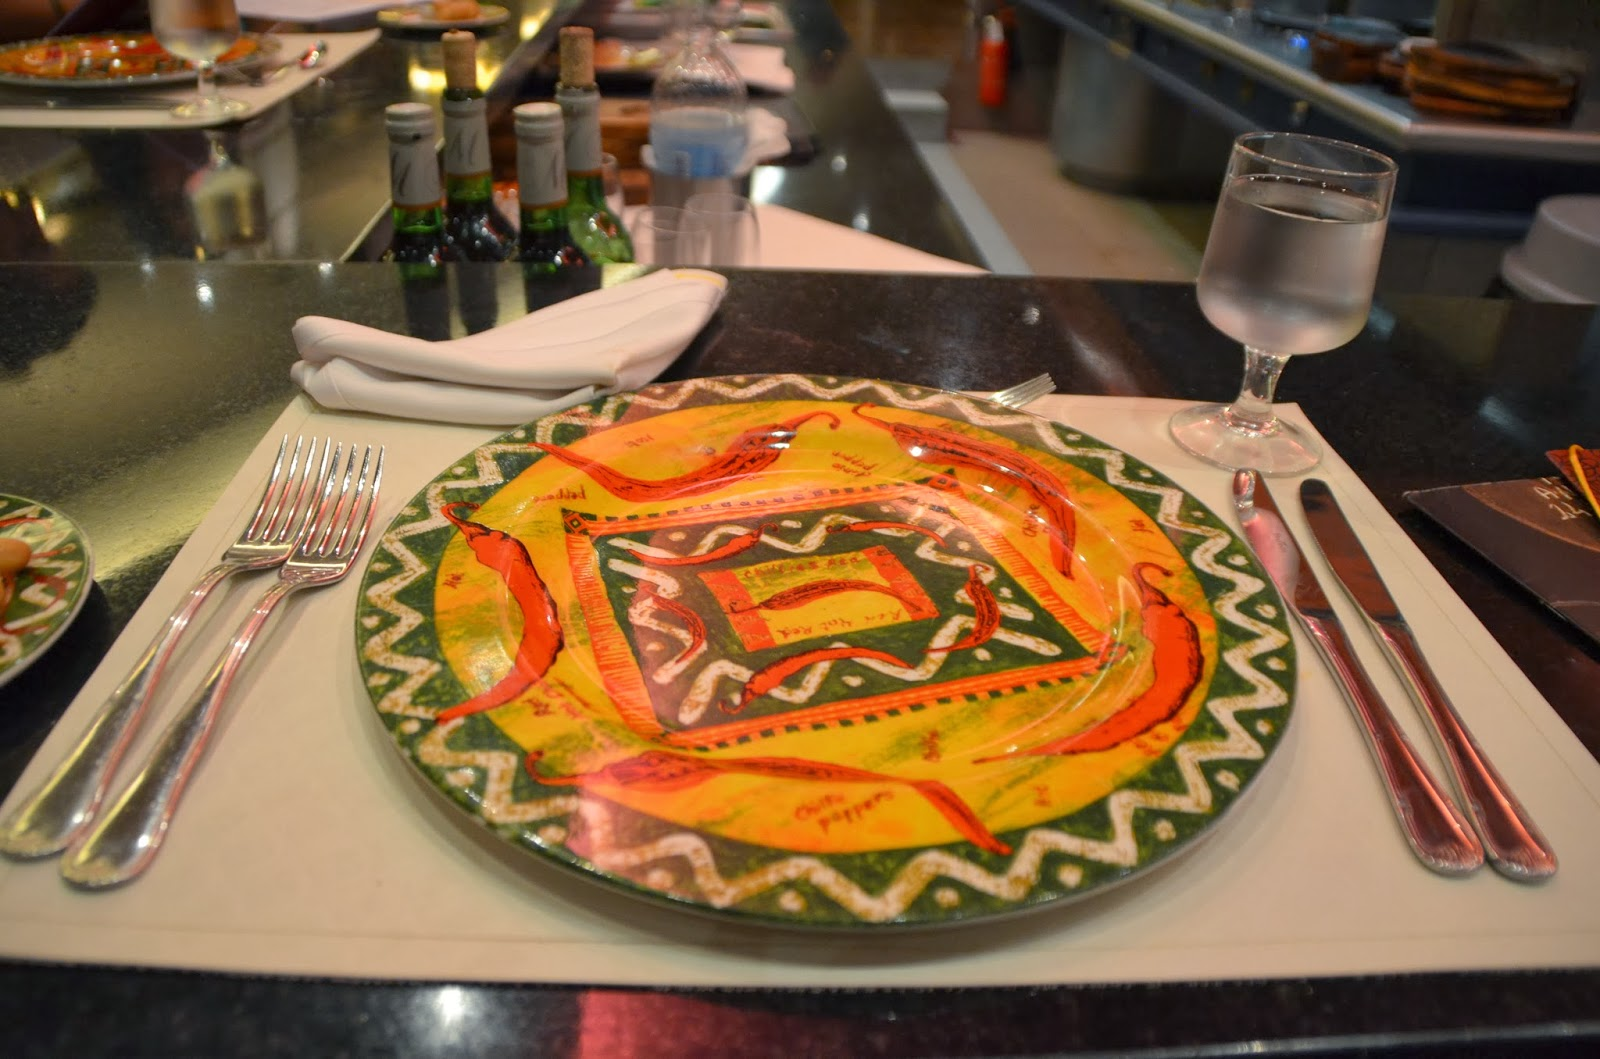 Restaurante de comida Mexicana.